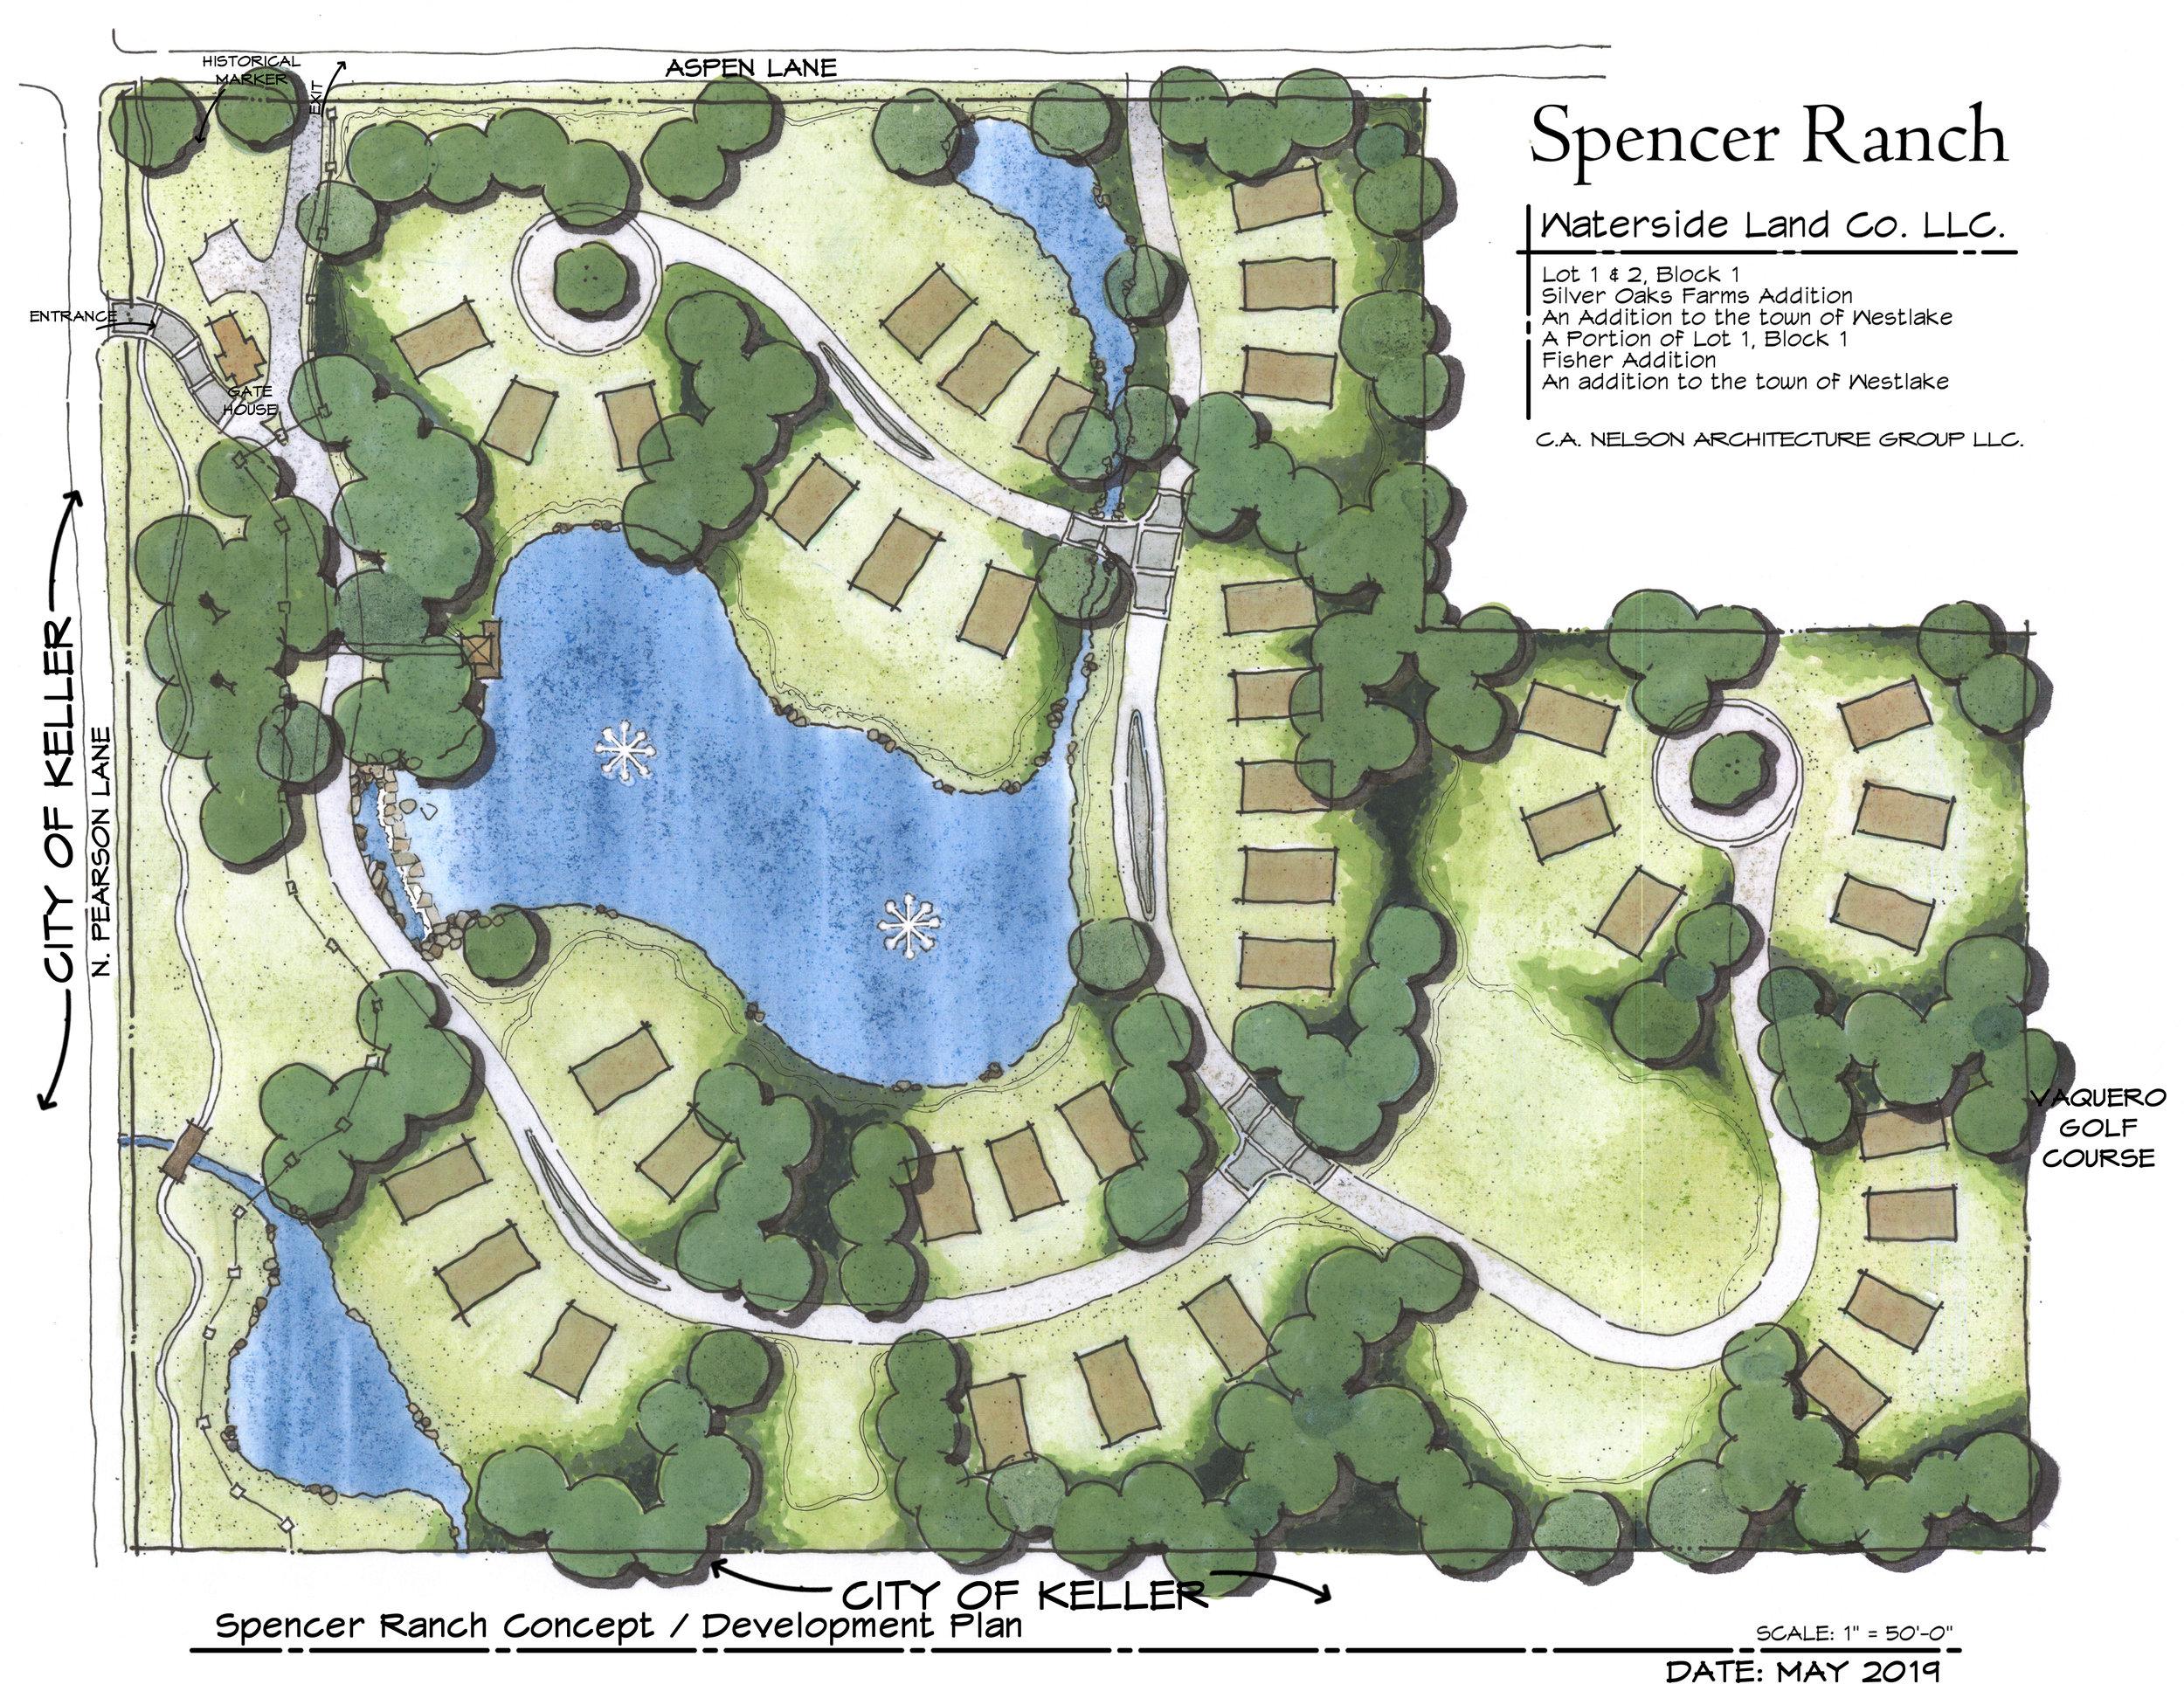 Spencer Ranch_development plan 04162019-2 (1).jpg